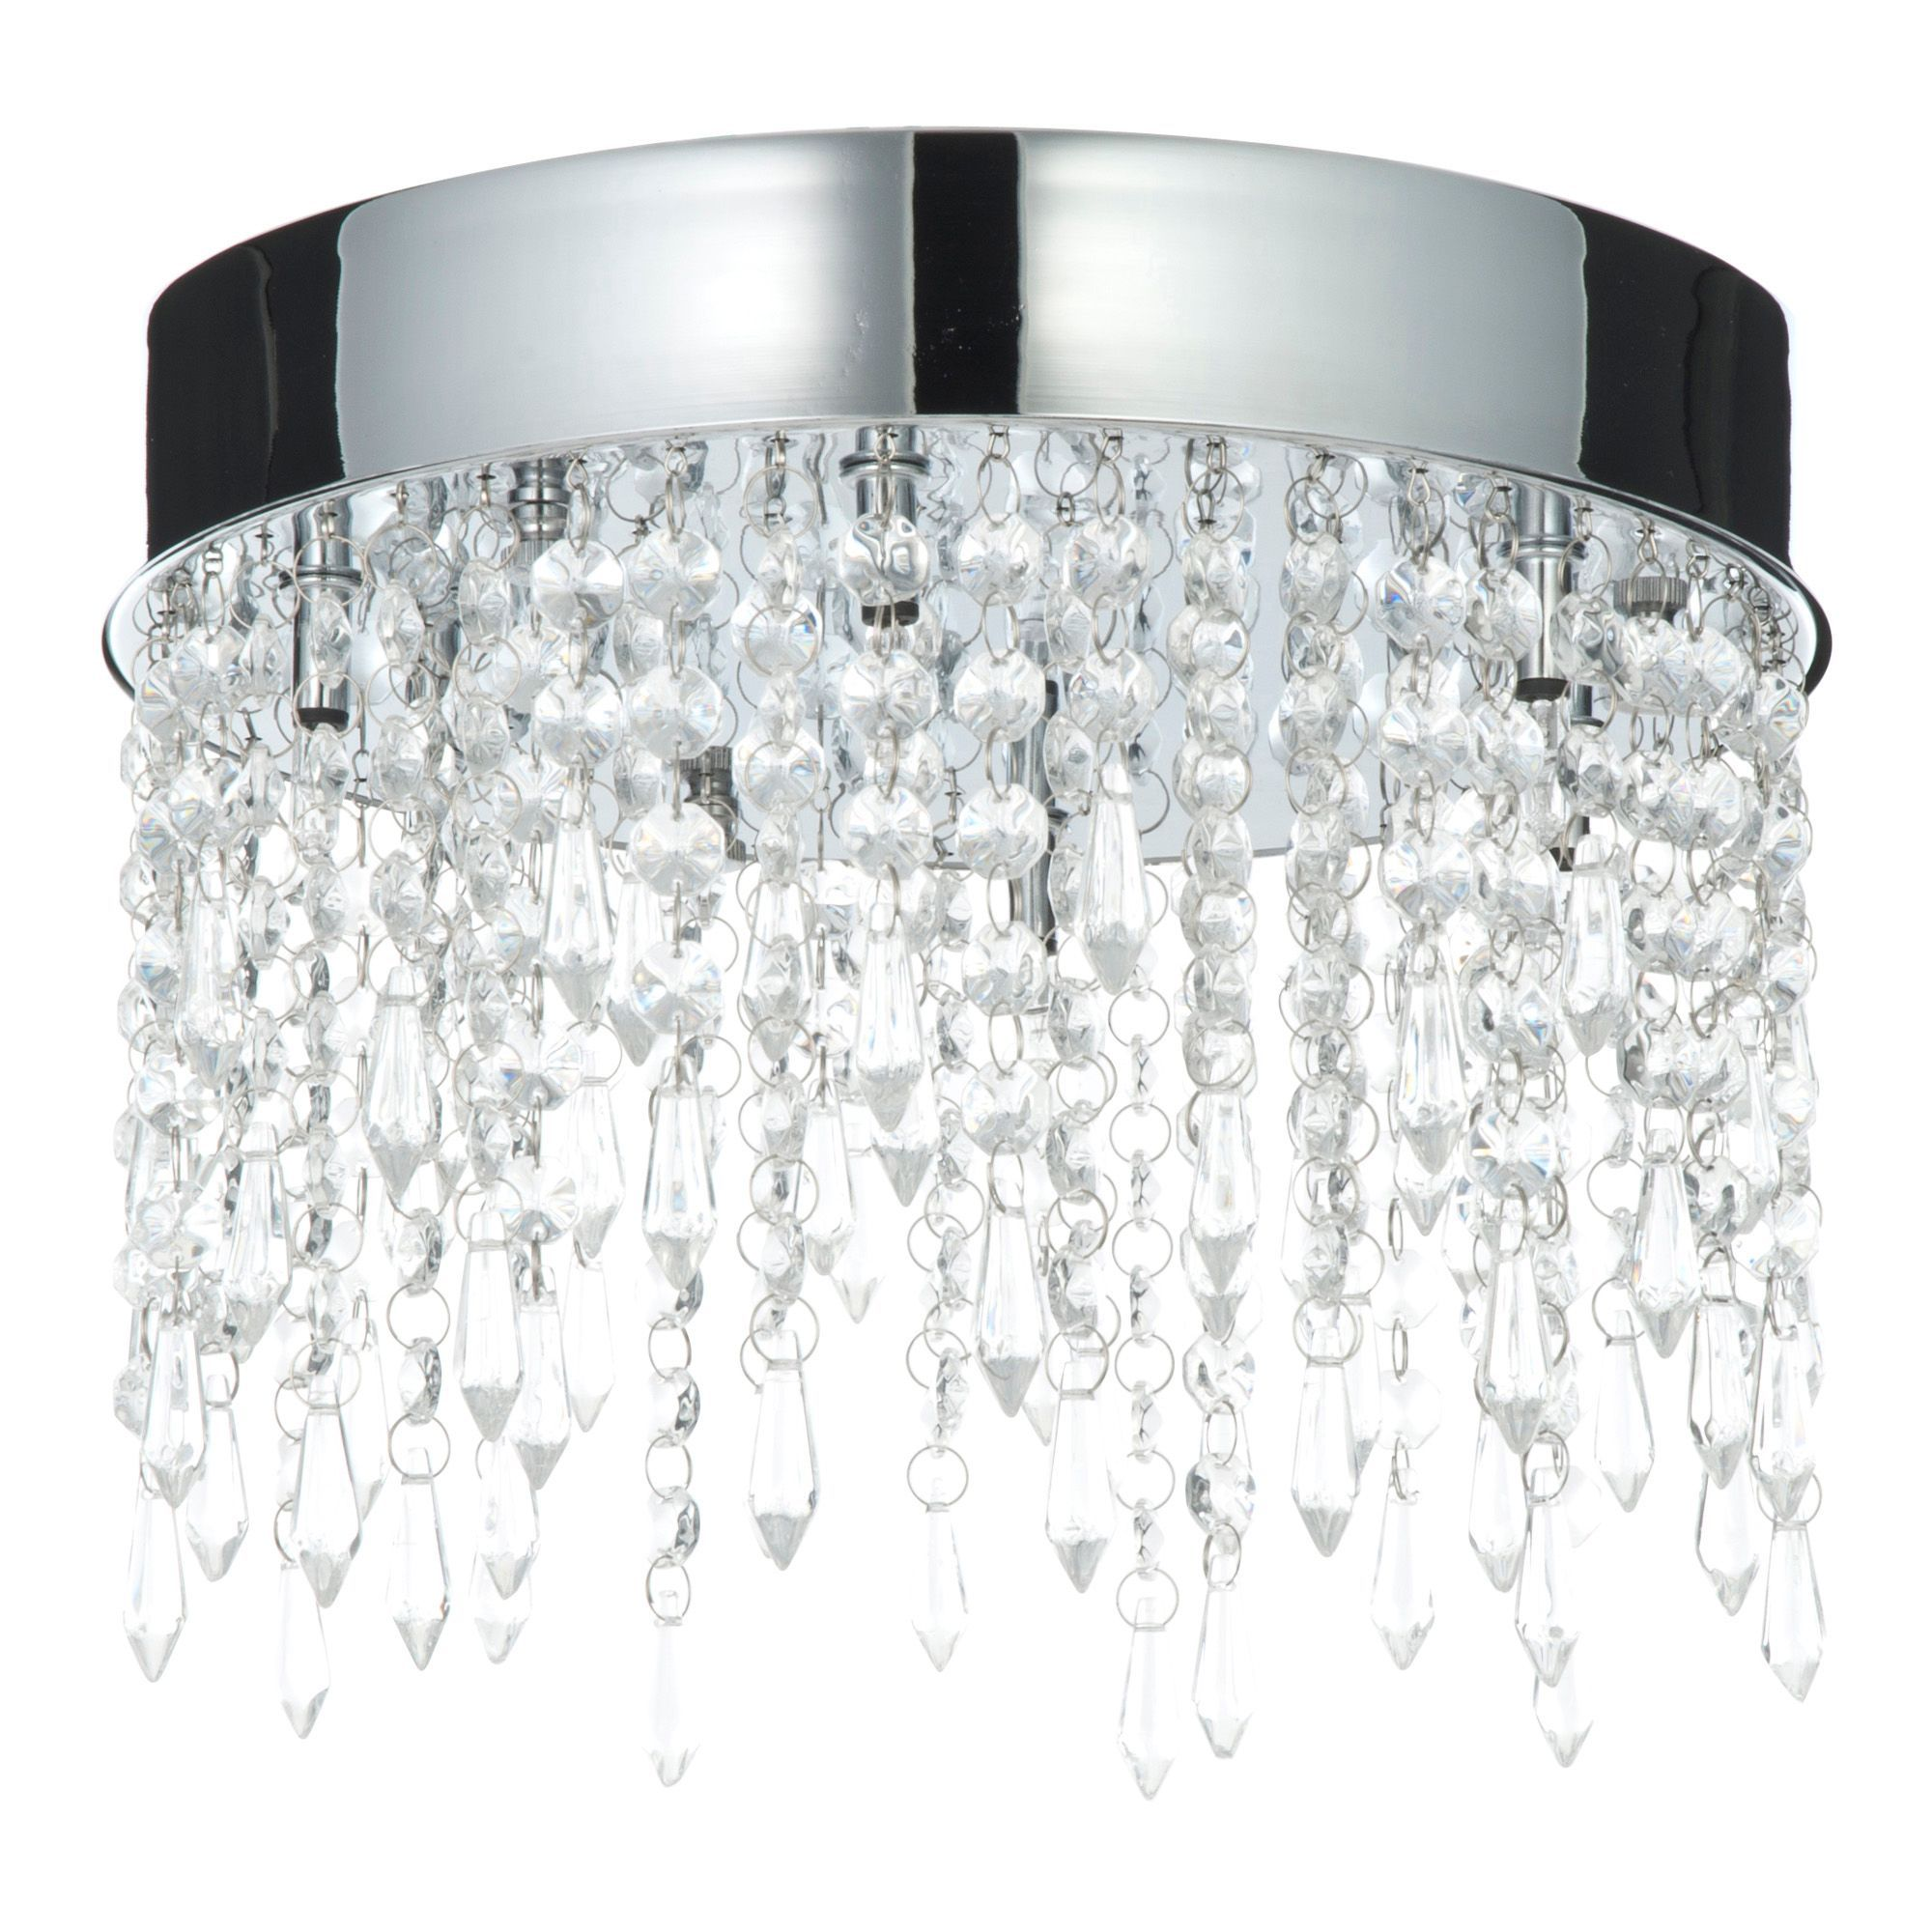 Sabine Crystal Droplets Clear 6 Lamp Flush Ceiling Light